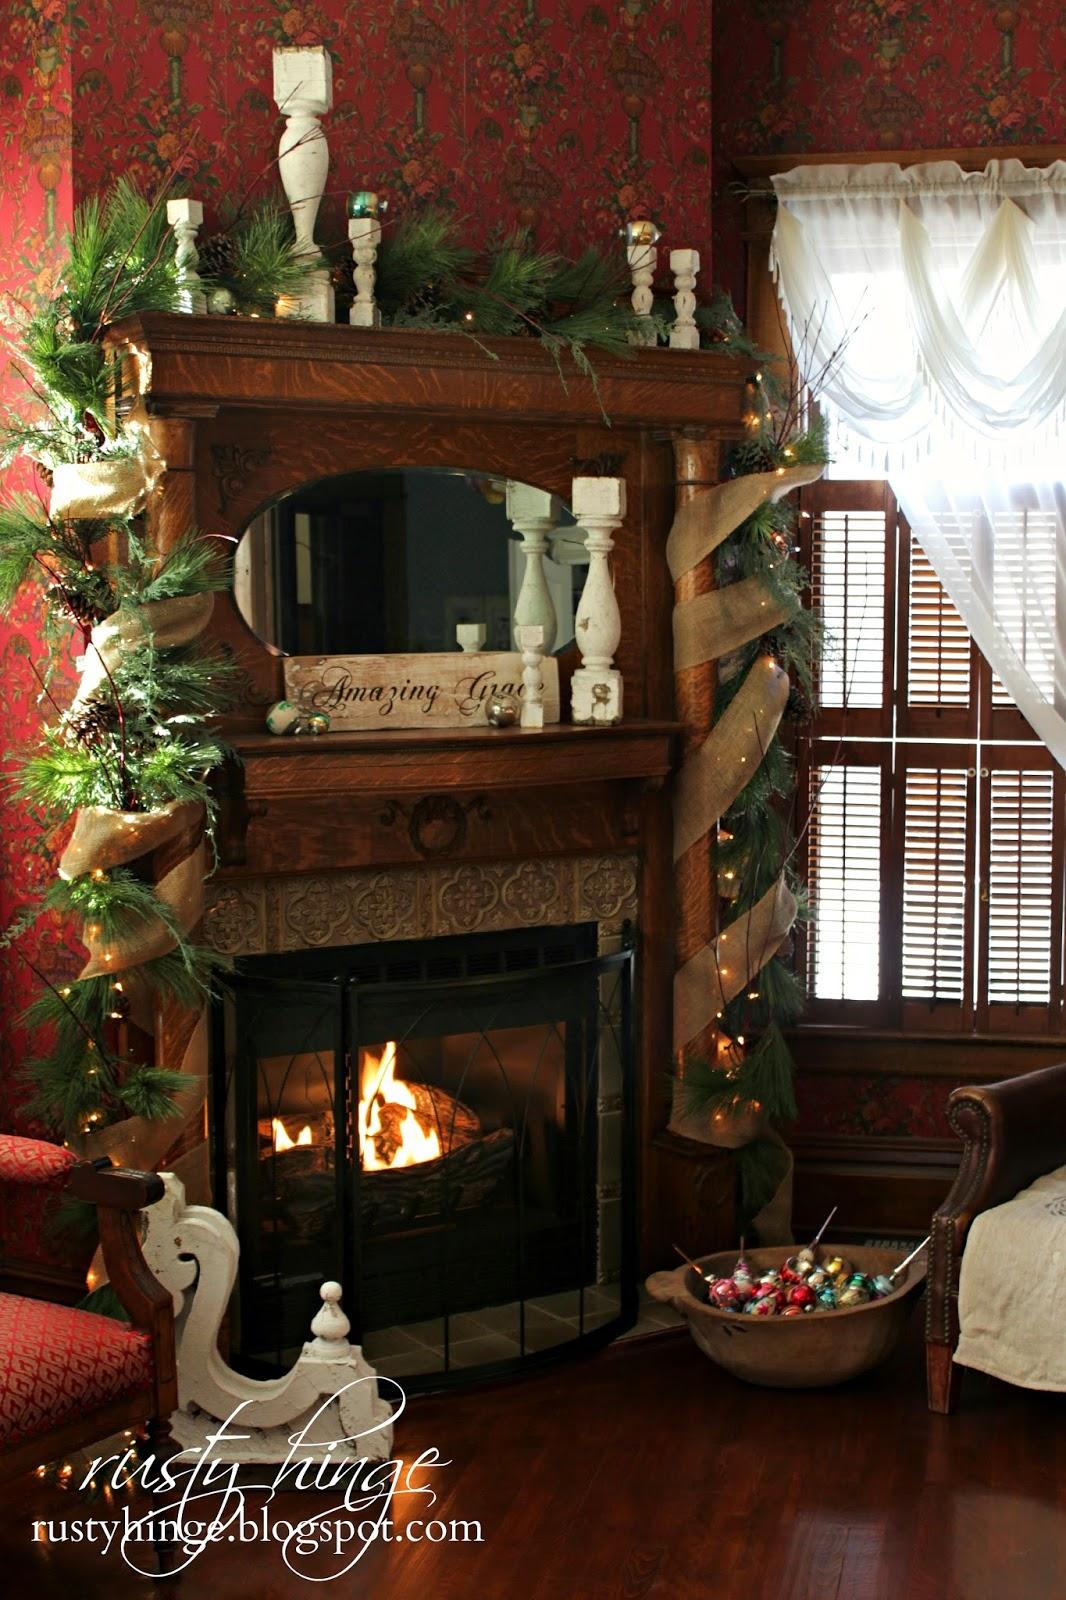 Amazing Grace Near the Fireplace